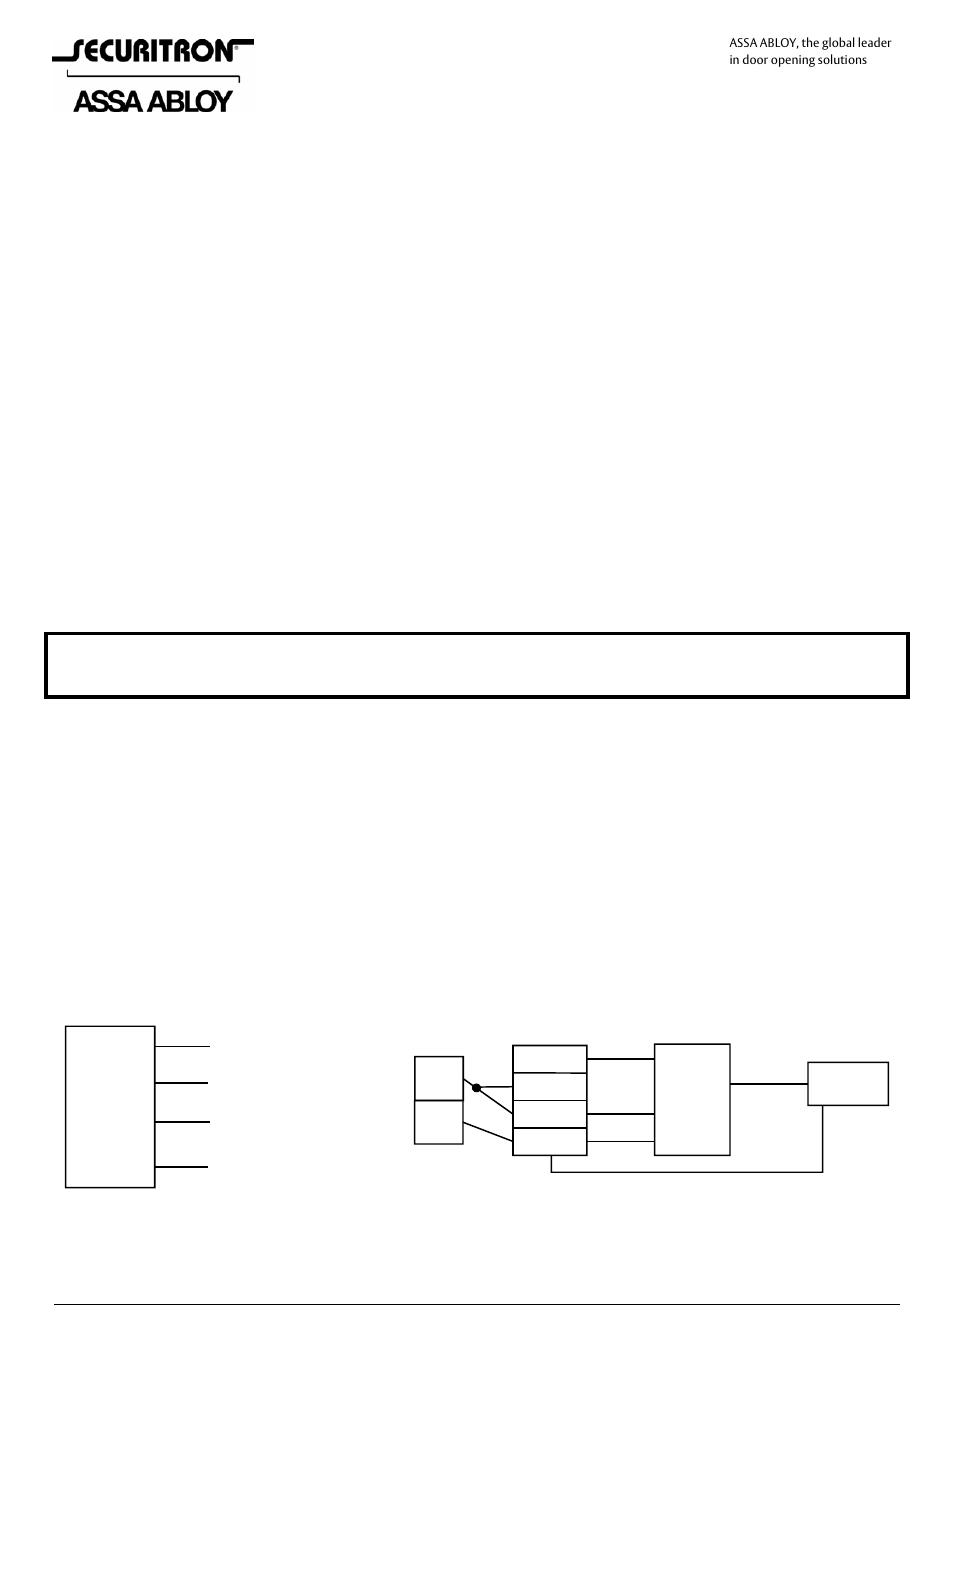 [DIAGRAM_3NM]  Securitron EEB3N User Manual | 2 pages | Also for: EEB2 | Securitron Wiring Diagrams |  | Manuals Directory